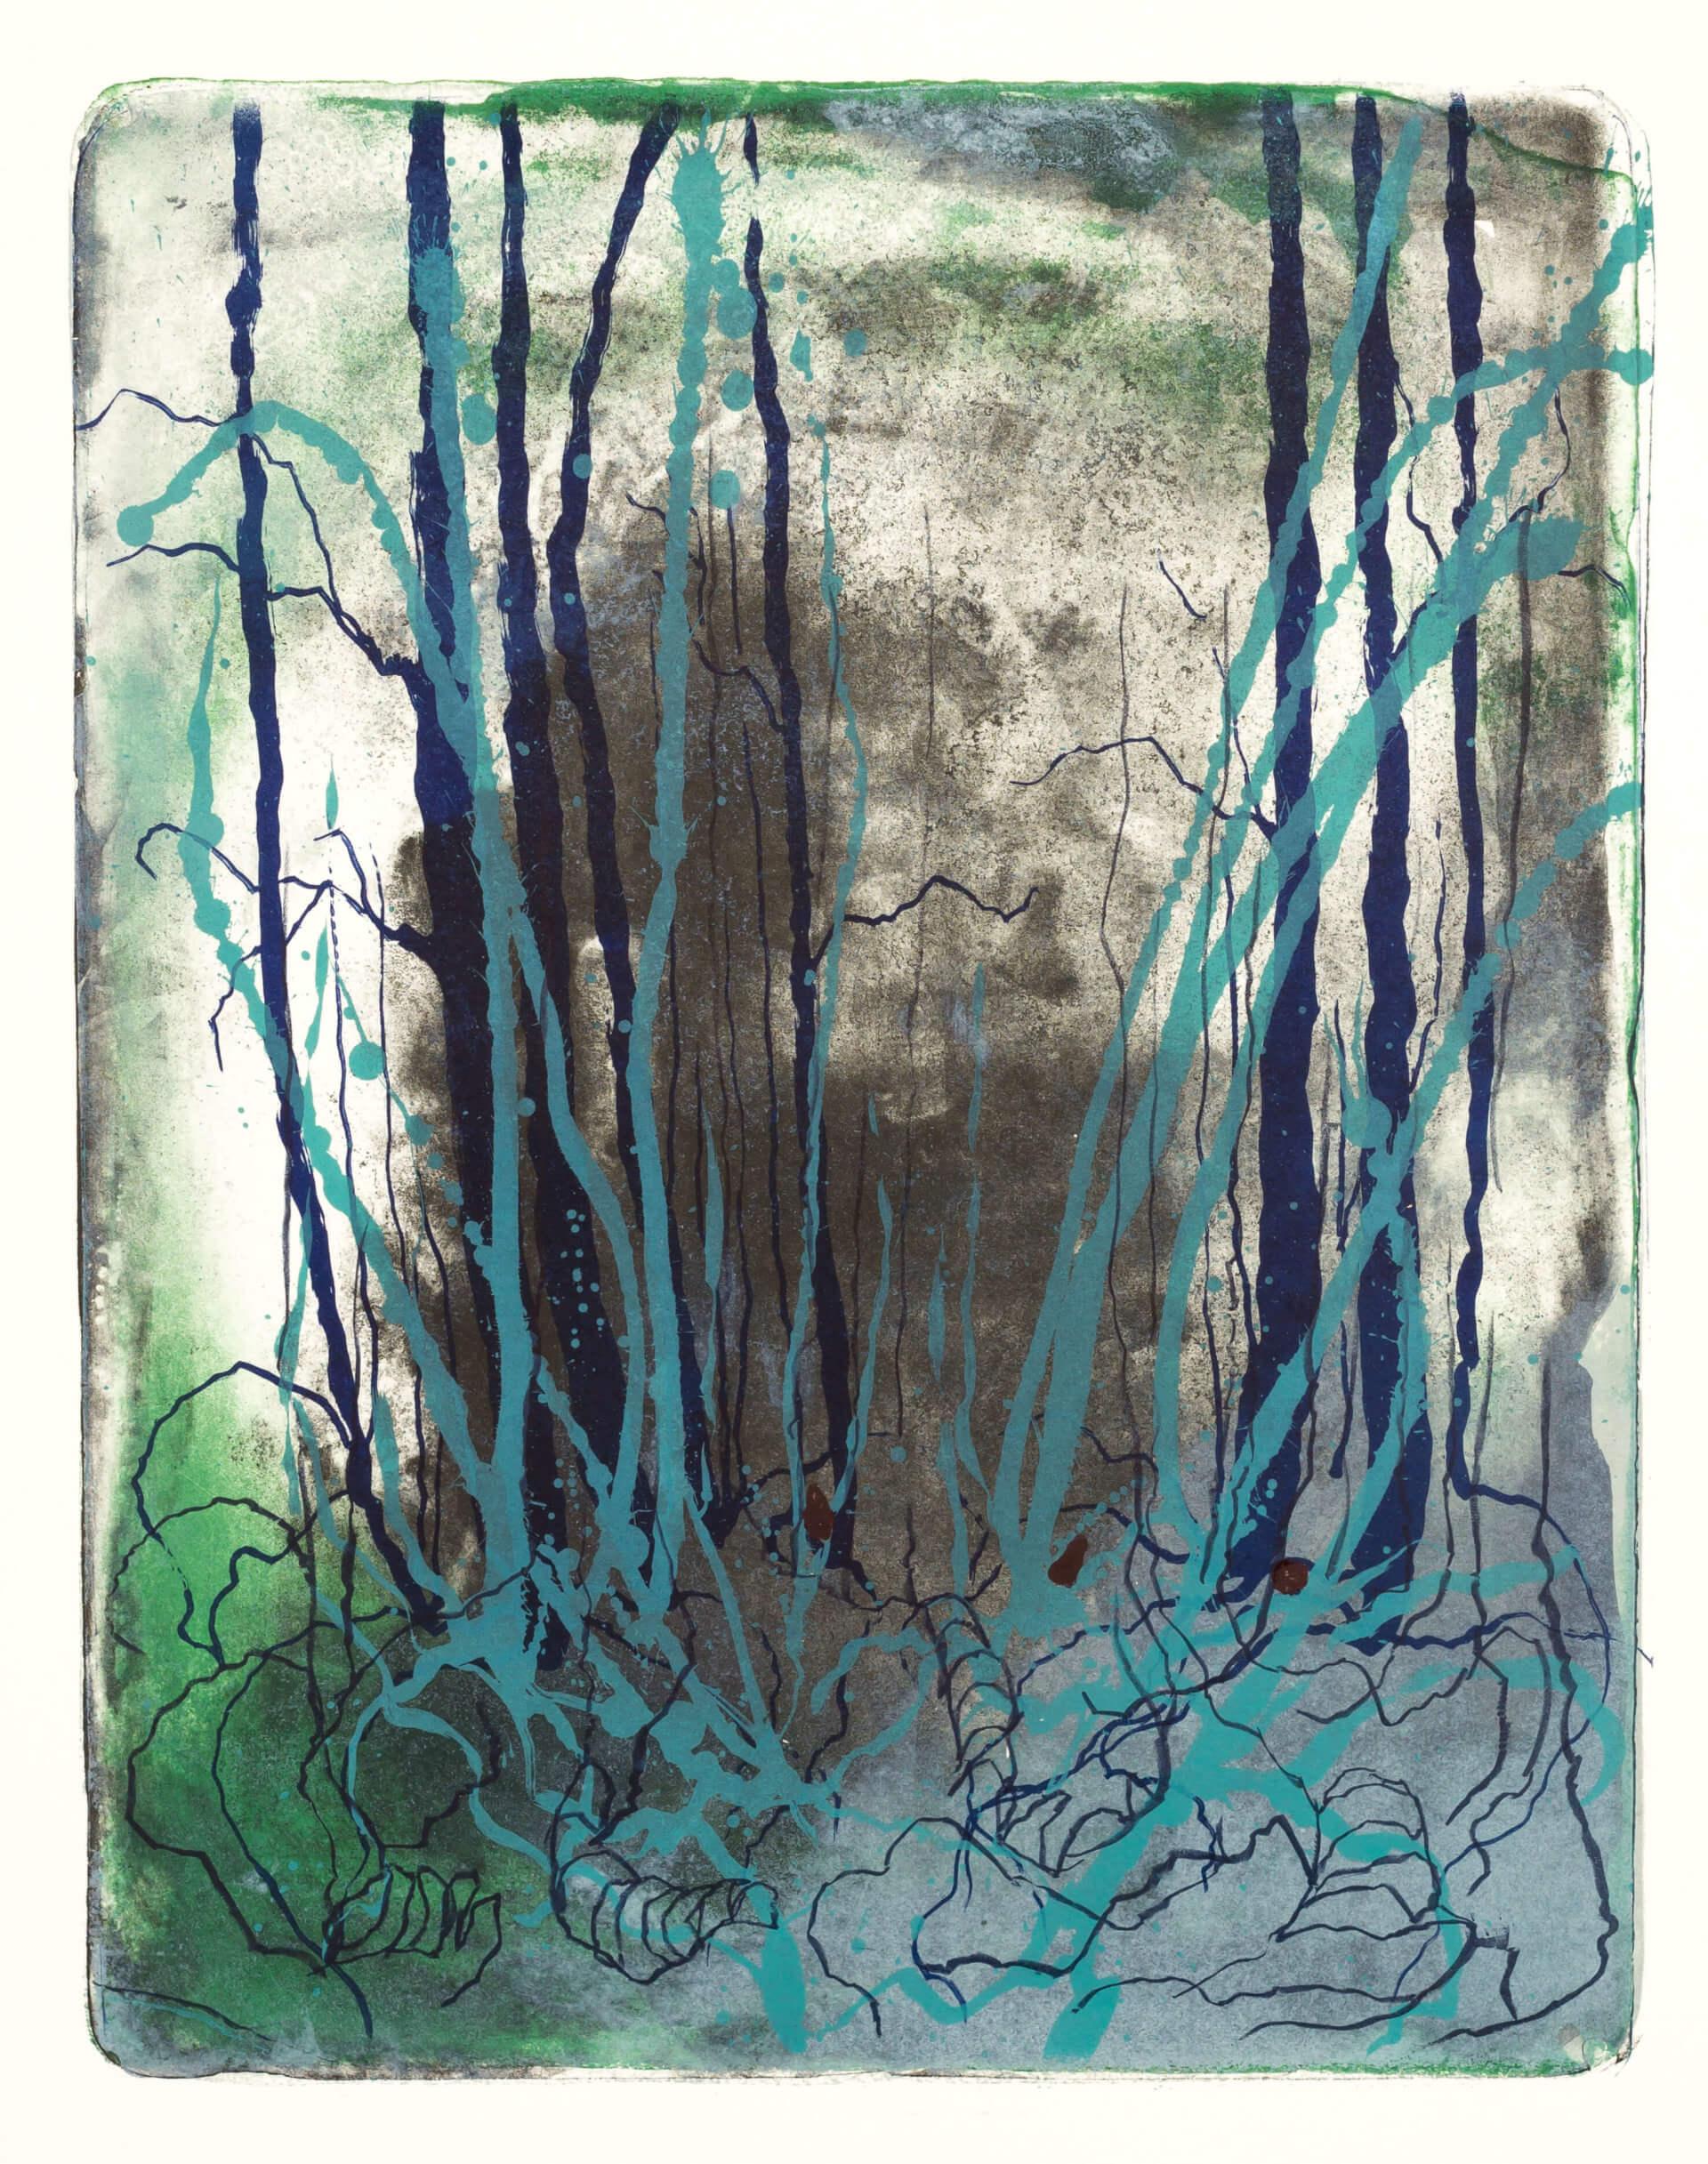 Wald X(K)-VIII, 2018, Farblithographie, Unikat, 50x40 cm.